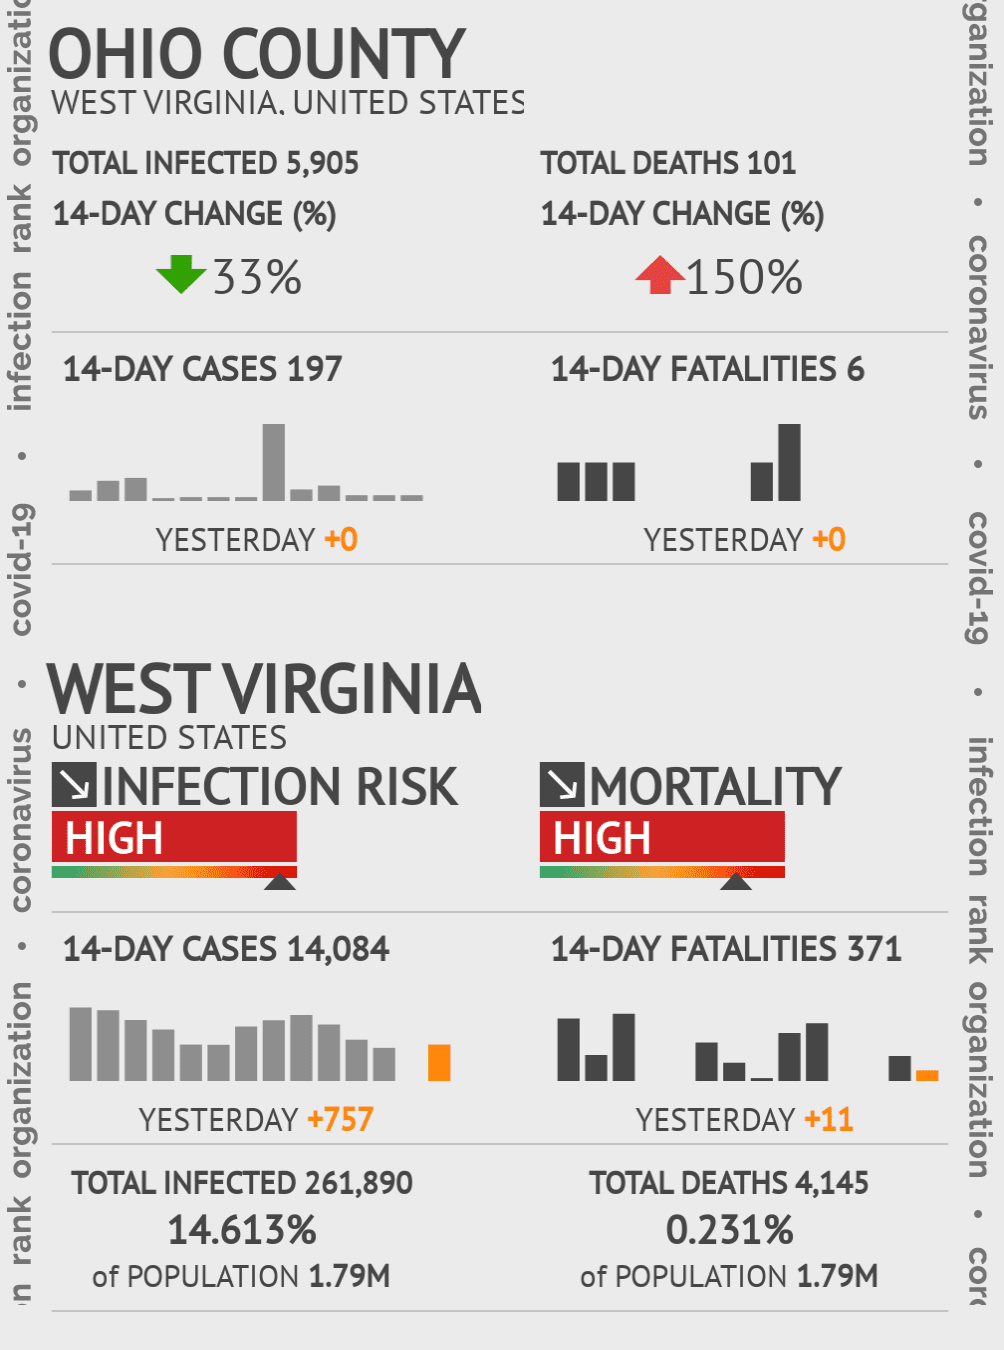 Ohio County Coronavirus Covid-19 Risk of Infection on March 23, 2021